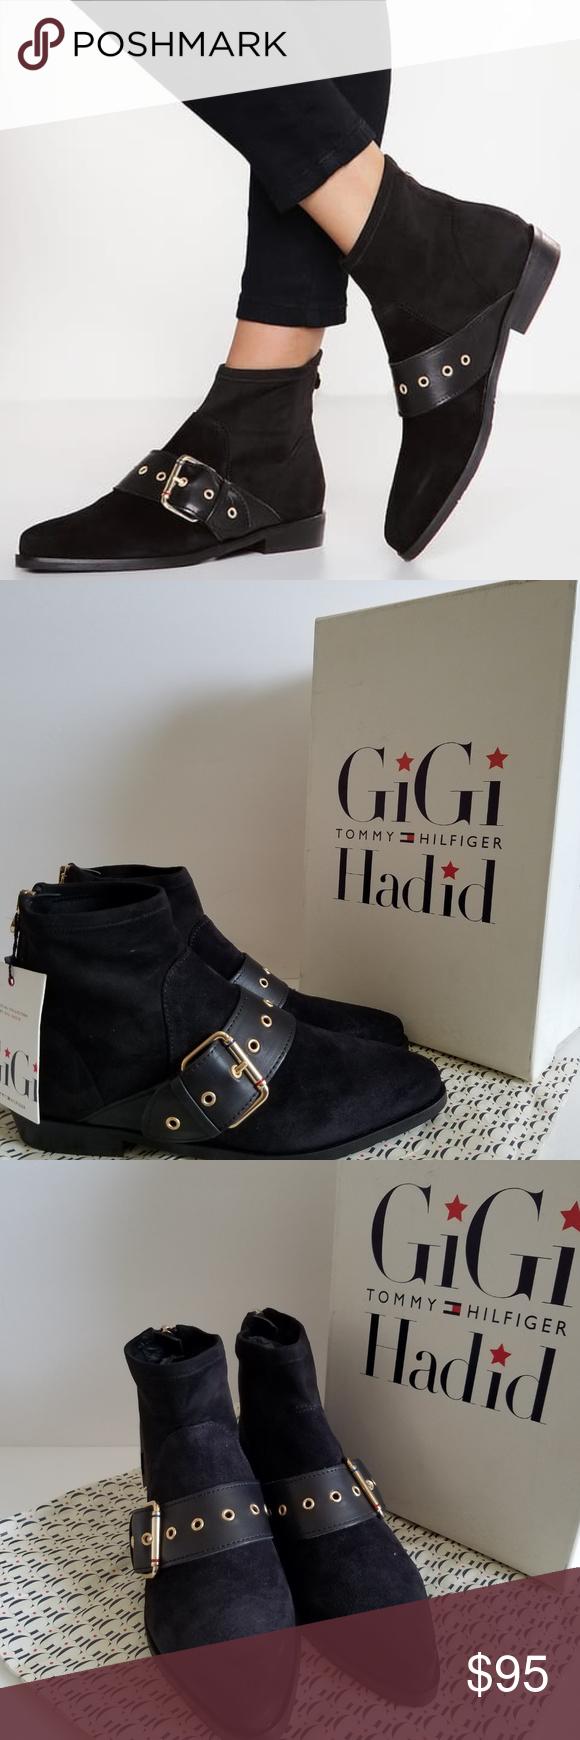 1c89486319cf Tommy Hilfiger GIGI HADID Black Ankle Flat Boots EUR Size 38 Original  Price   179.50 Material